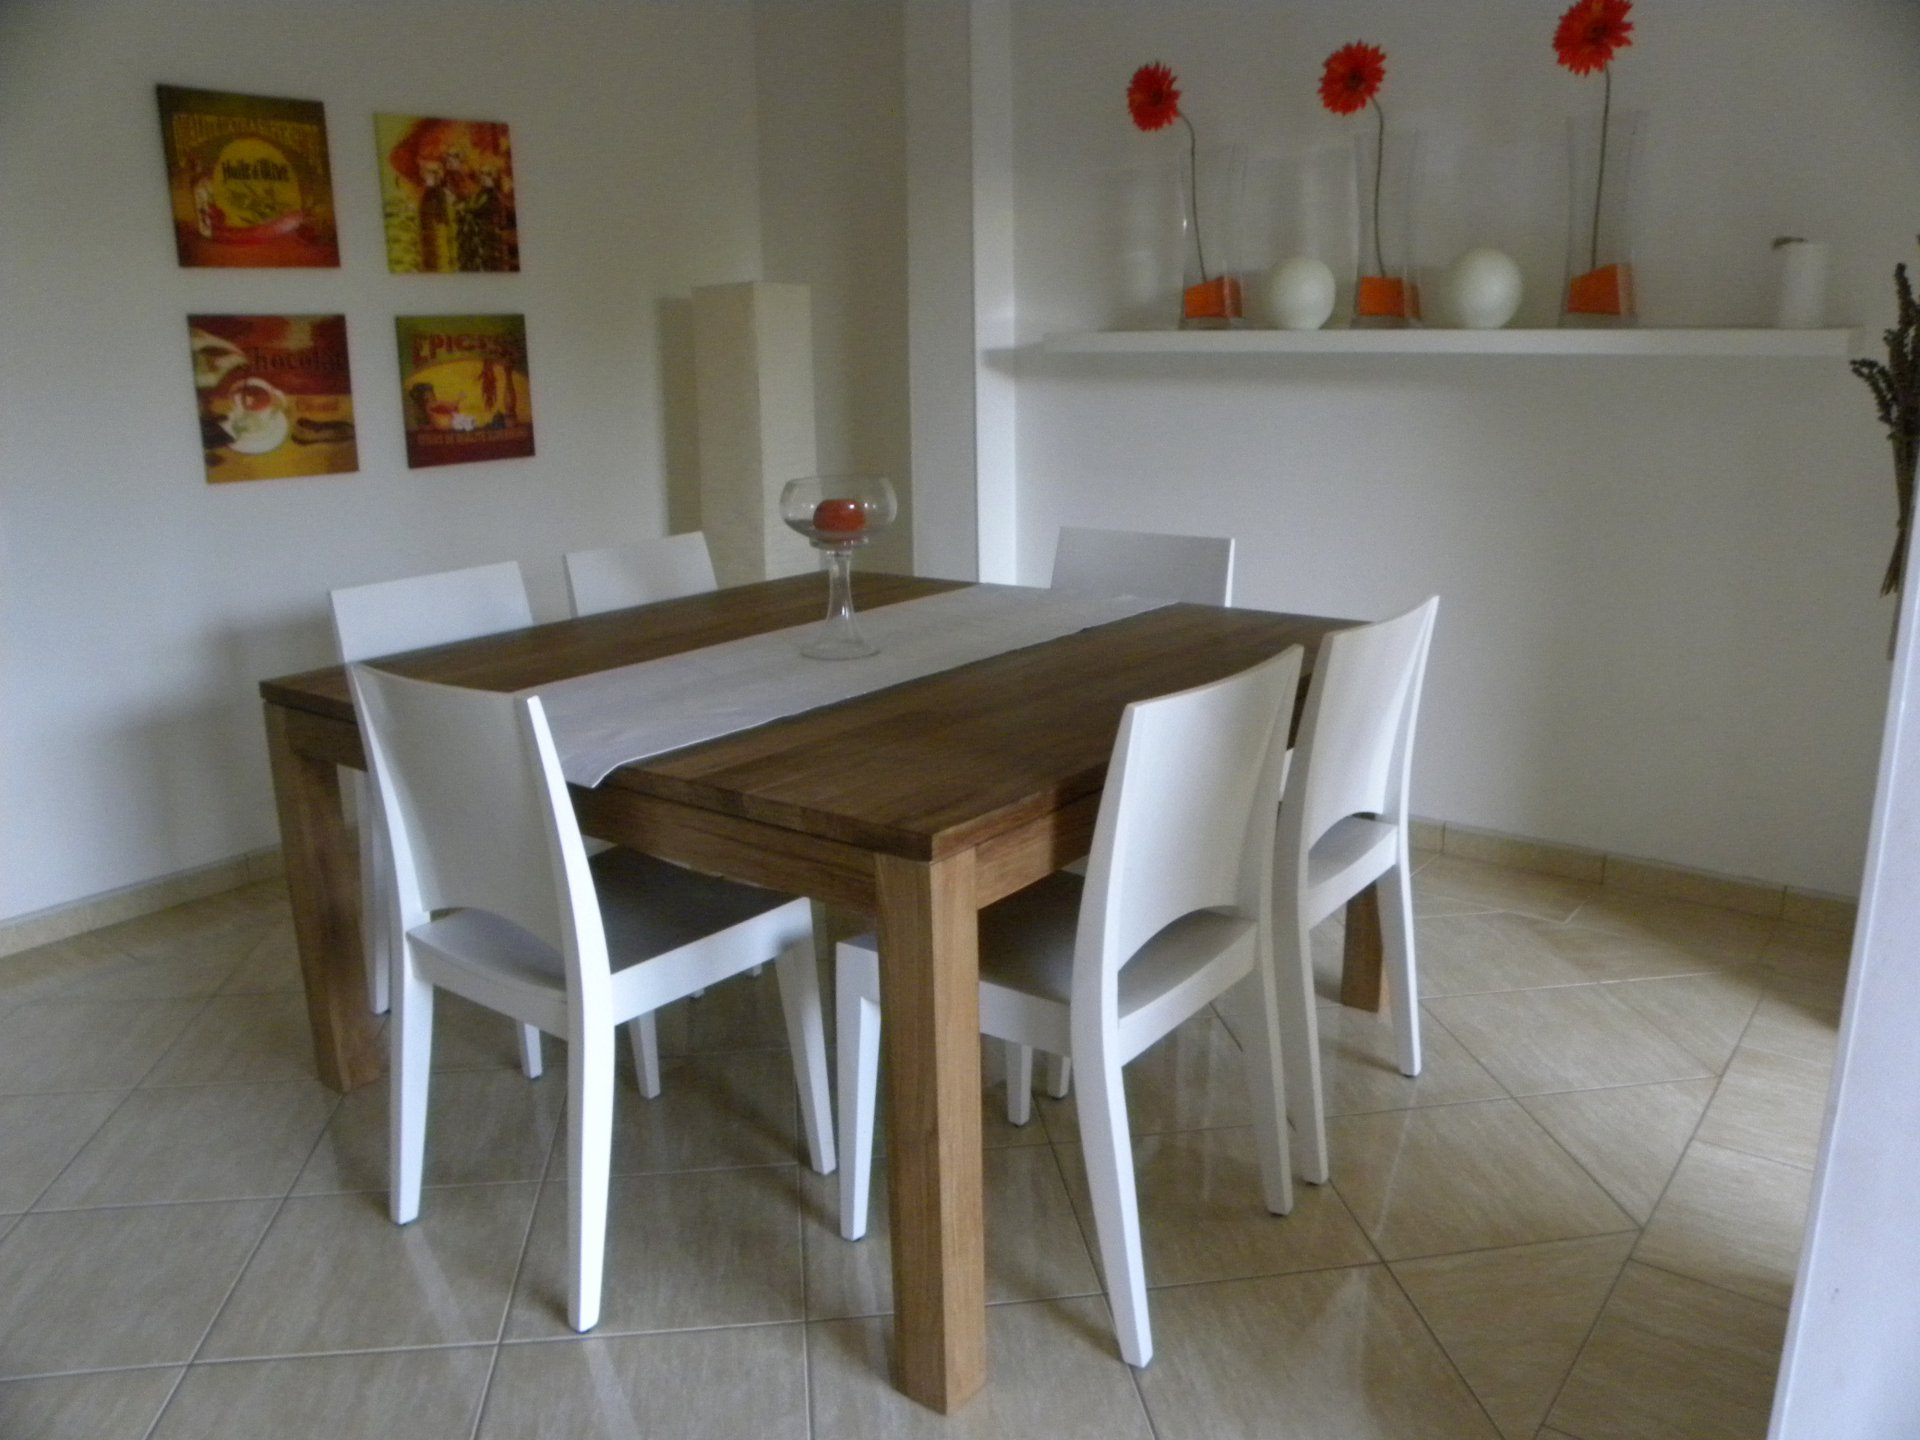 BANDOL LOCATION VACANCES T3 CLOS FANNY Appartement 3 Pièces 55m² + Jardin